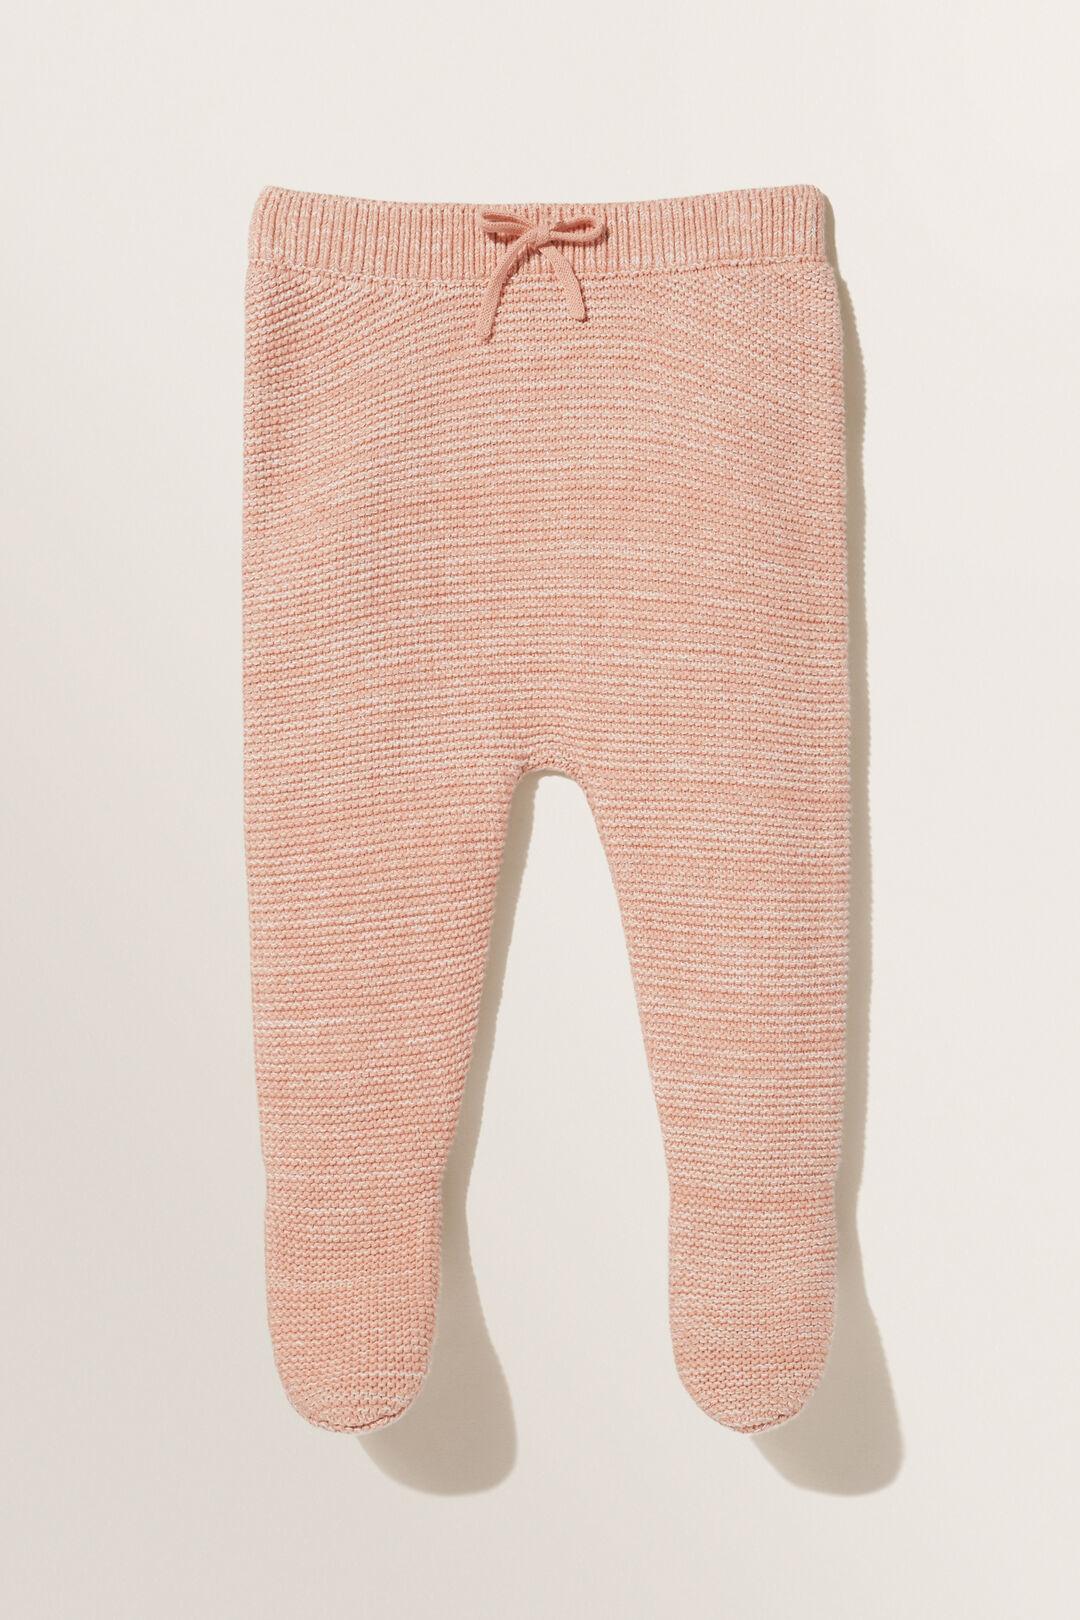 Footed Leggings  Pink Clay  hi-res